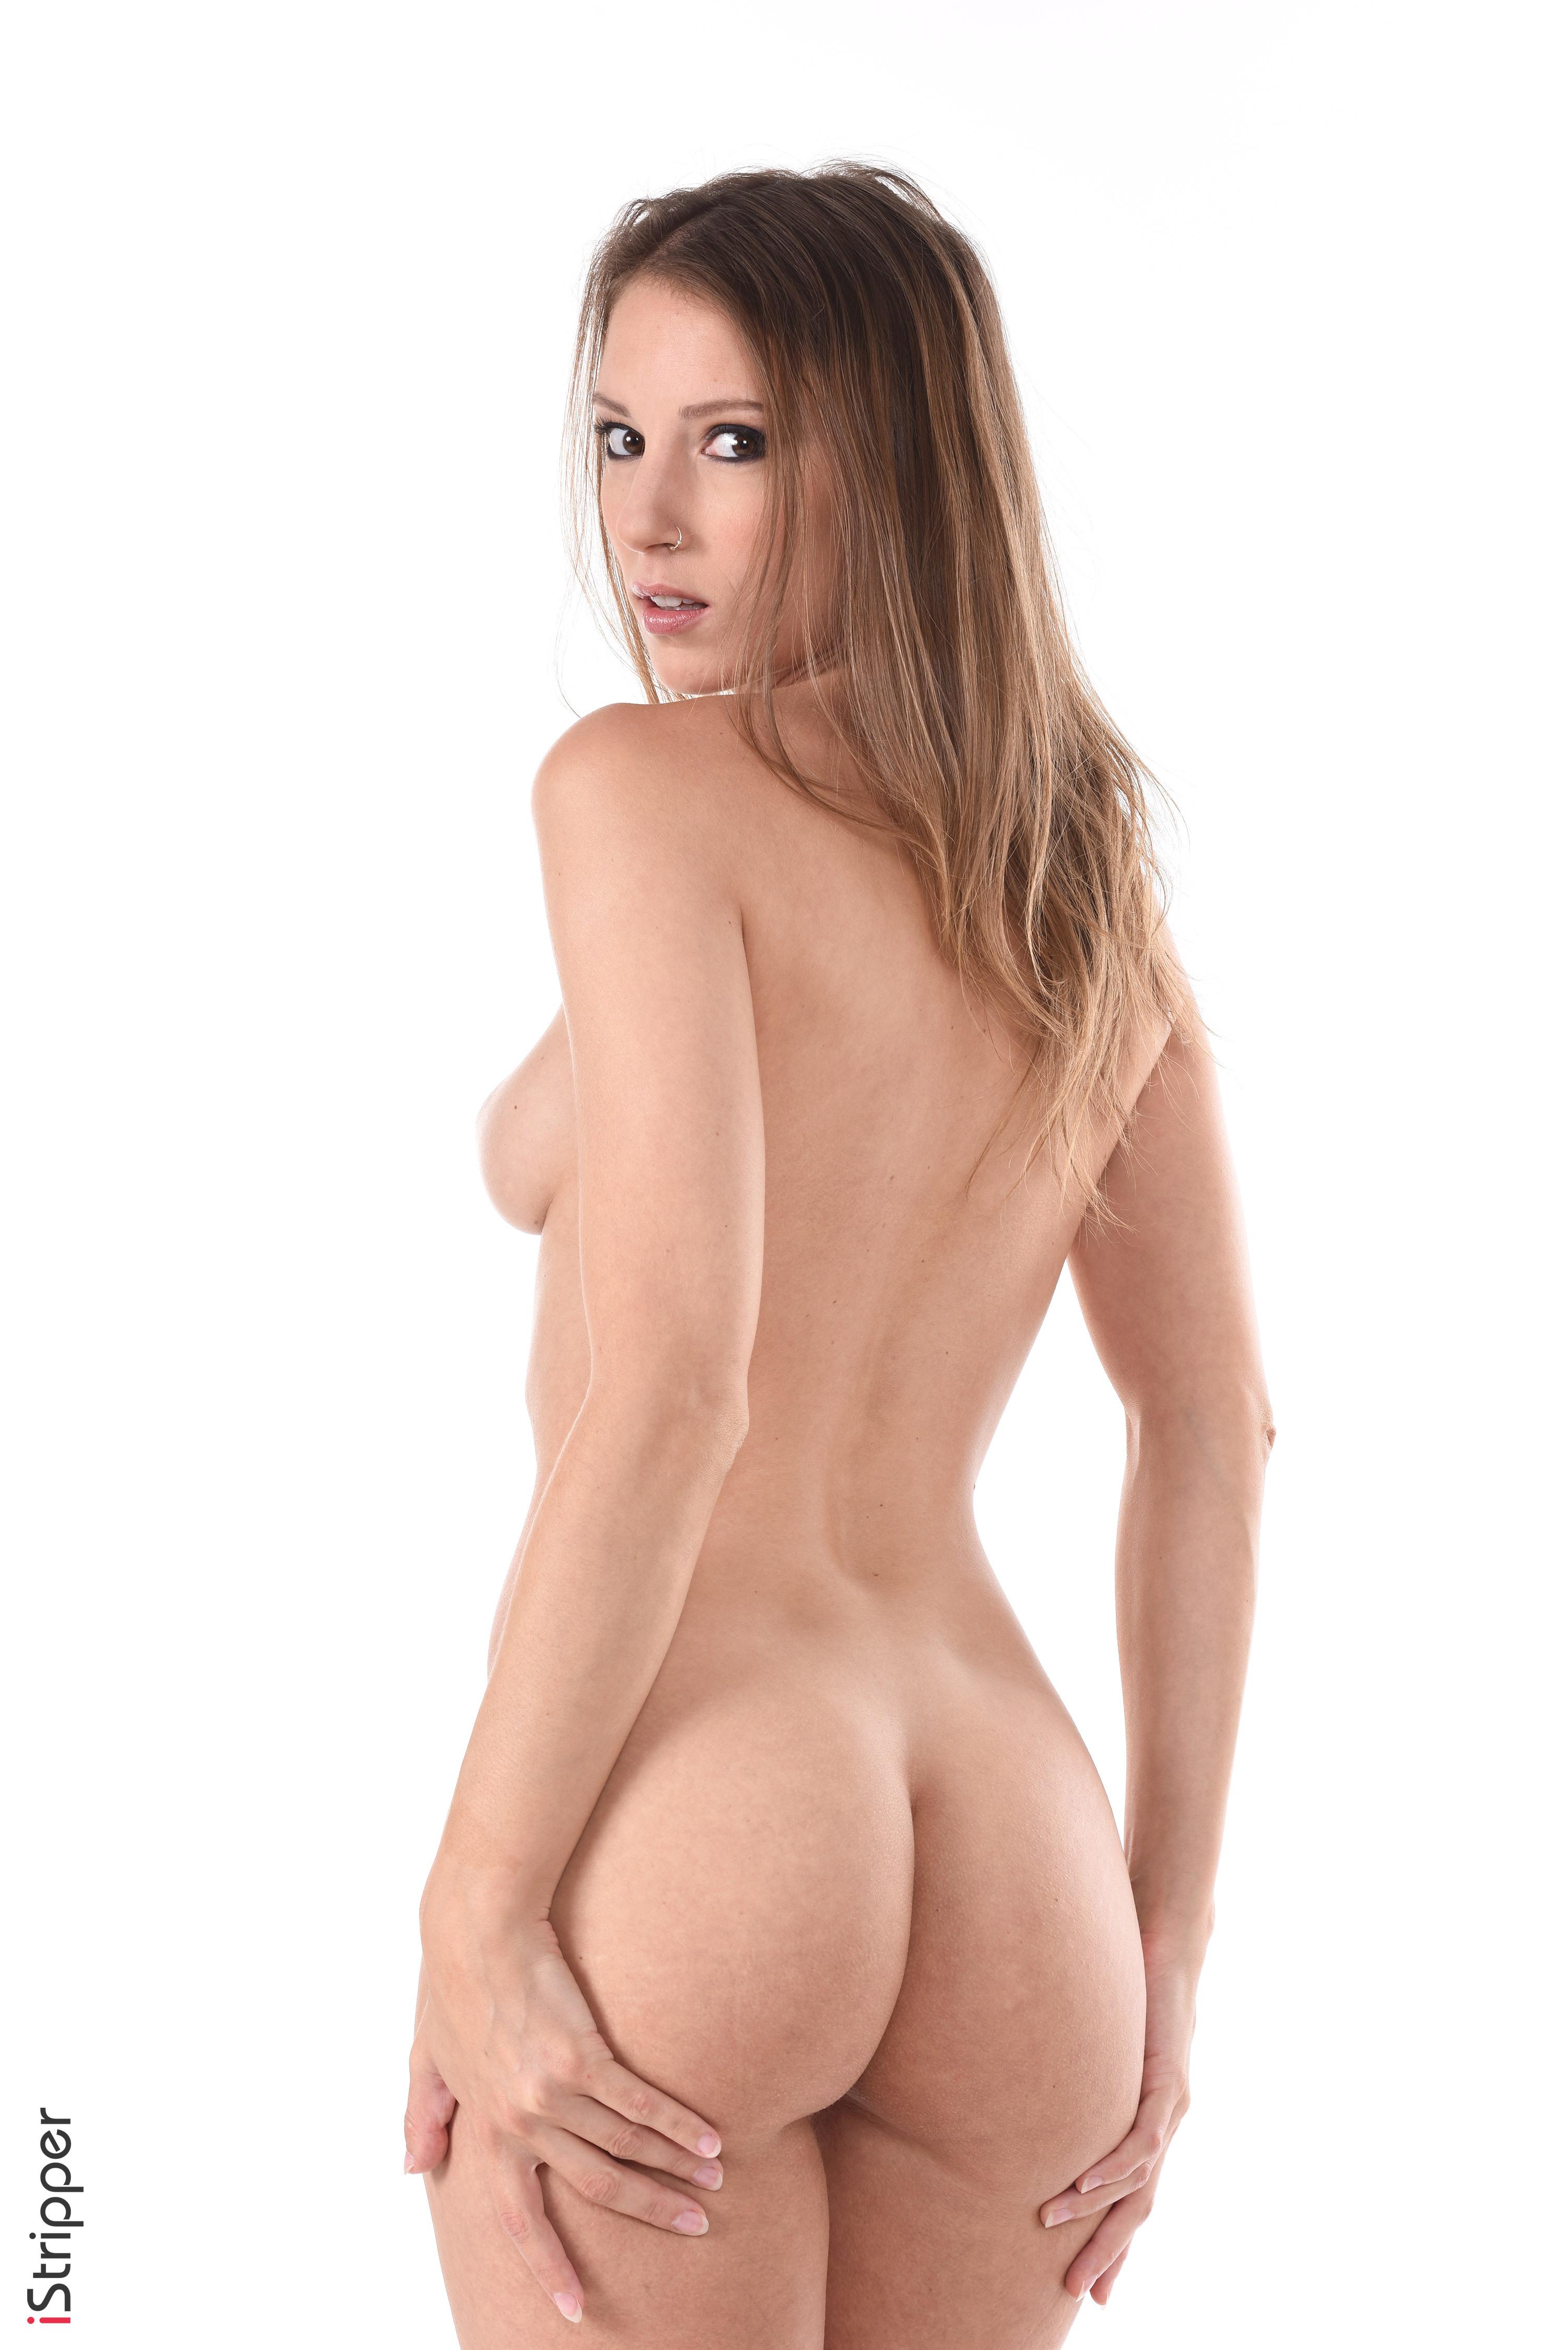 awesome sexy striptease